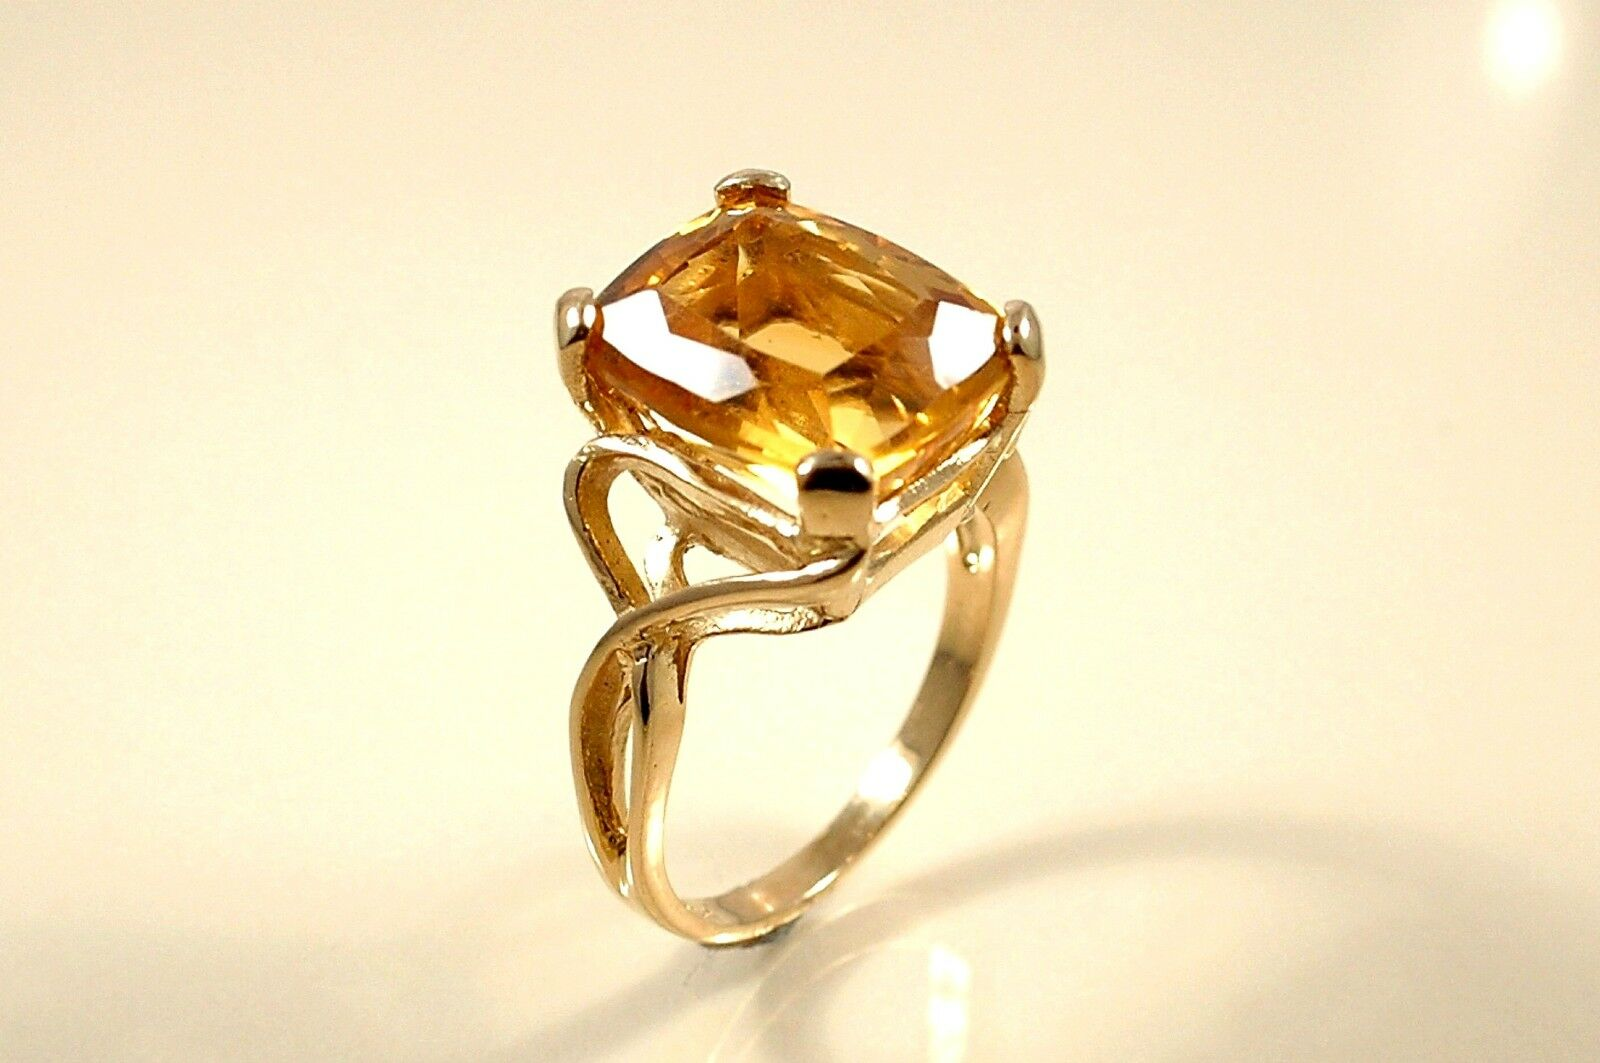 5.90 ct CUSHION CUT NATURAL BRAZILIAN CITRINE in Retro 14 kt Yellow gold Ring